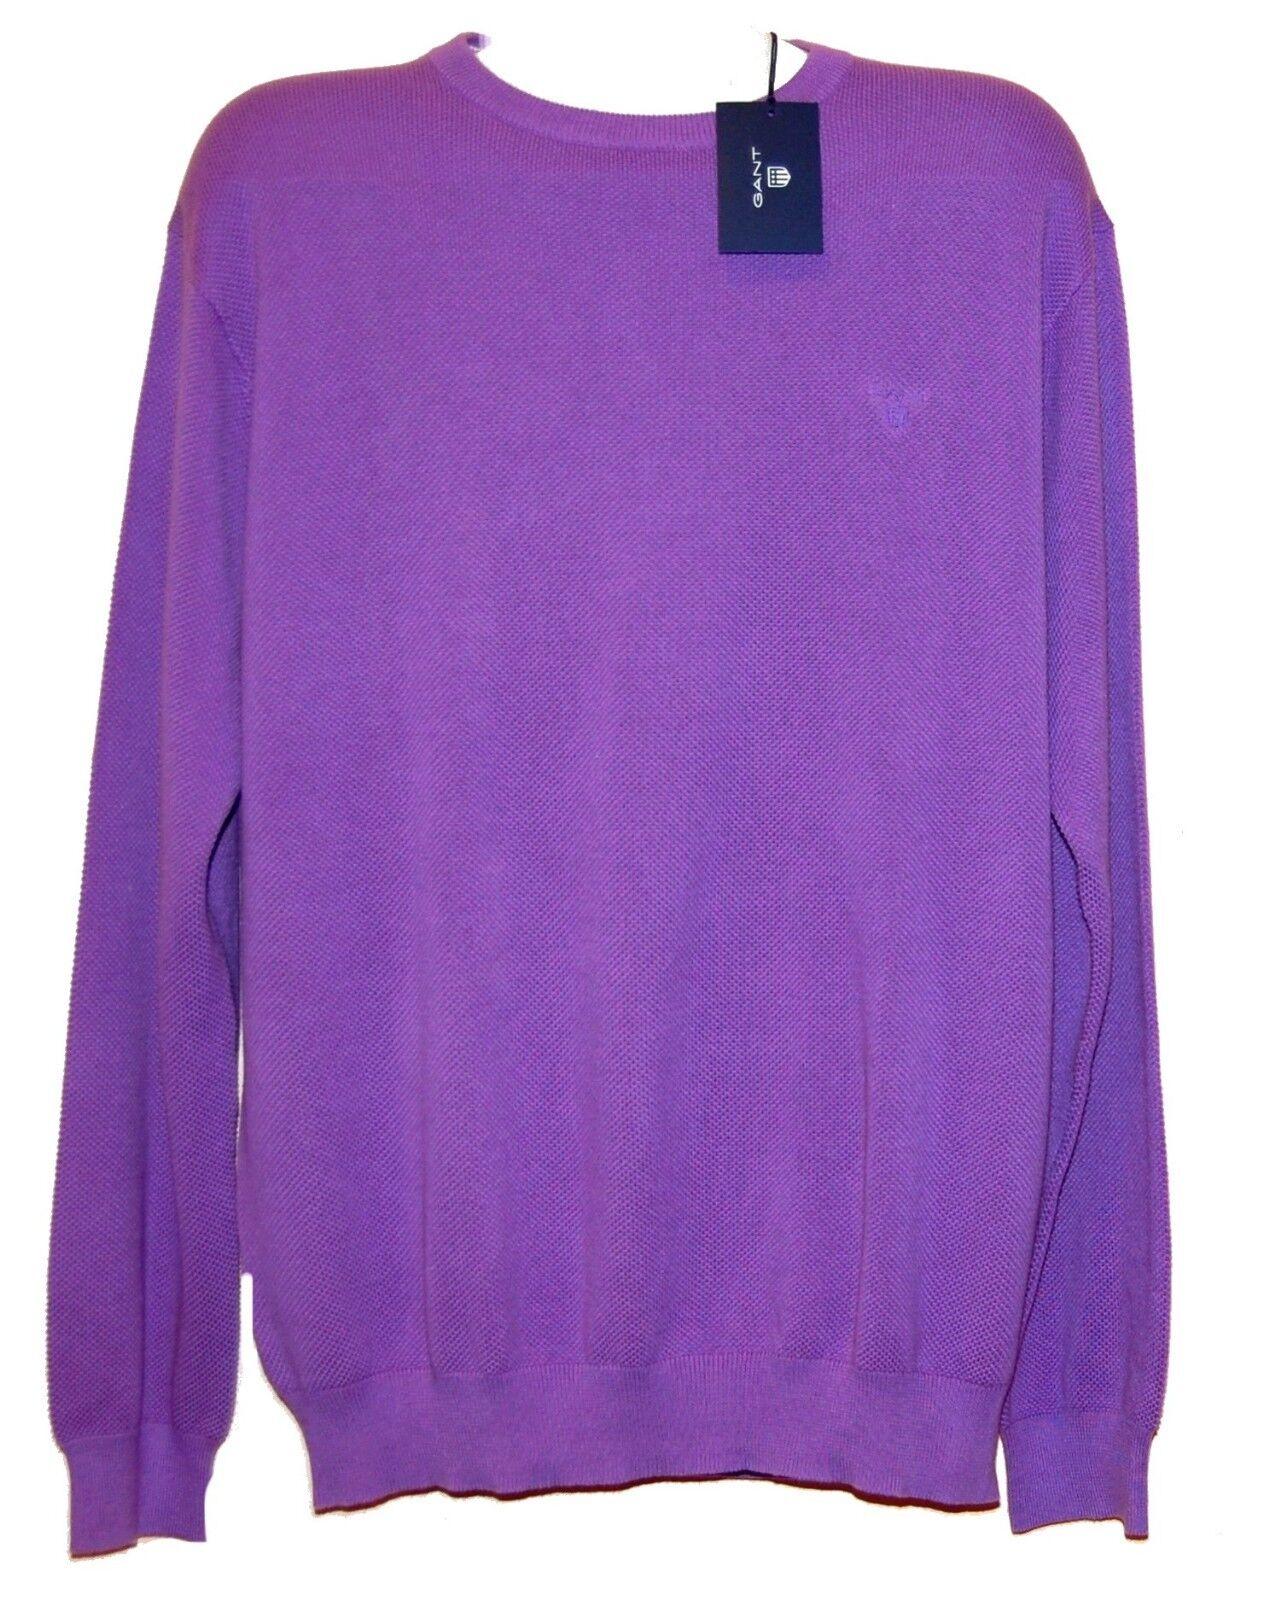 Gant Sweater Light Purple Long Sleeve Cotton Men's Size US 2XL NEW